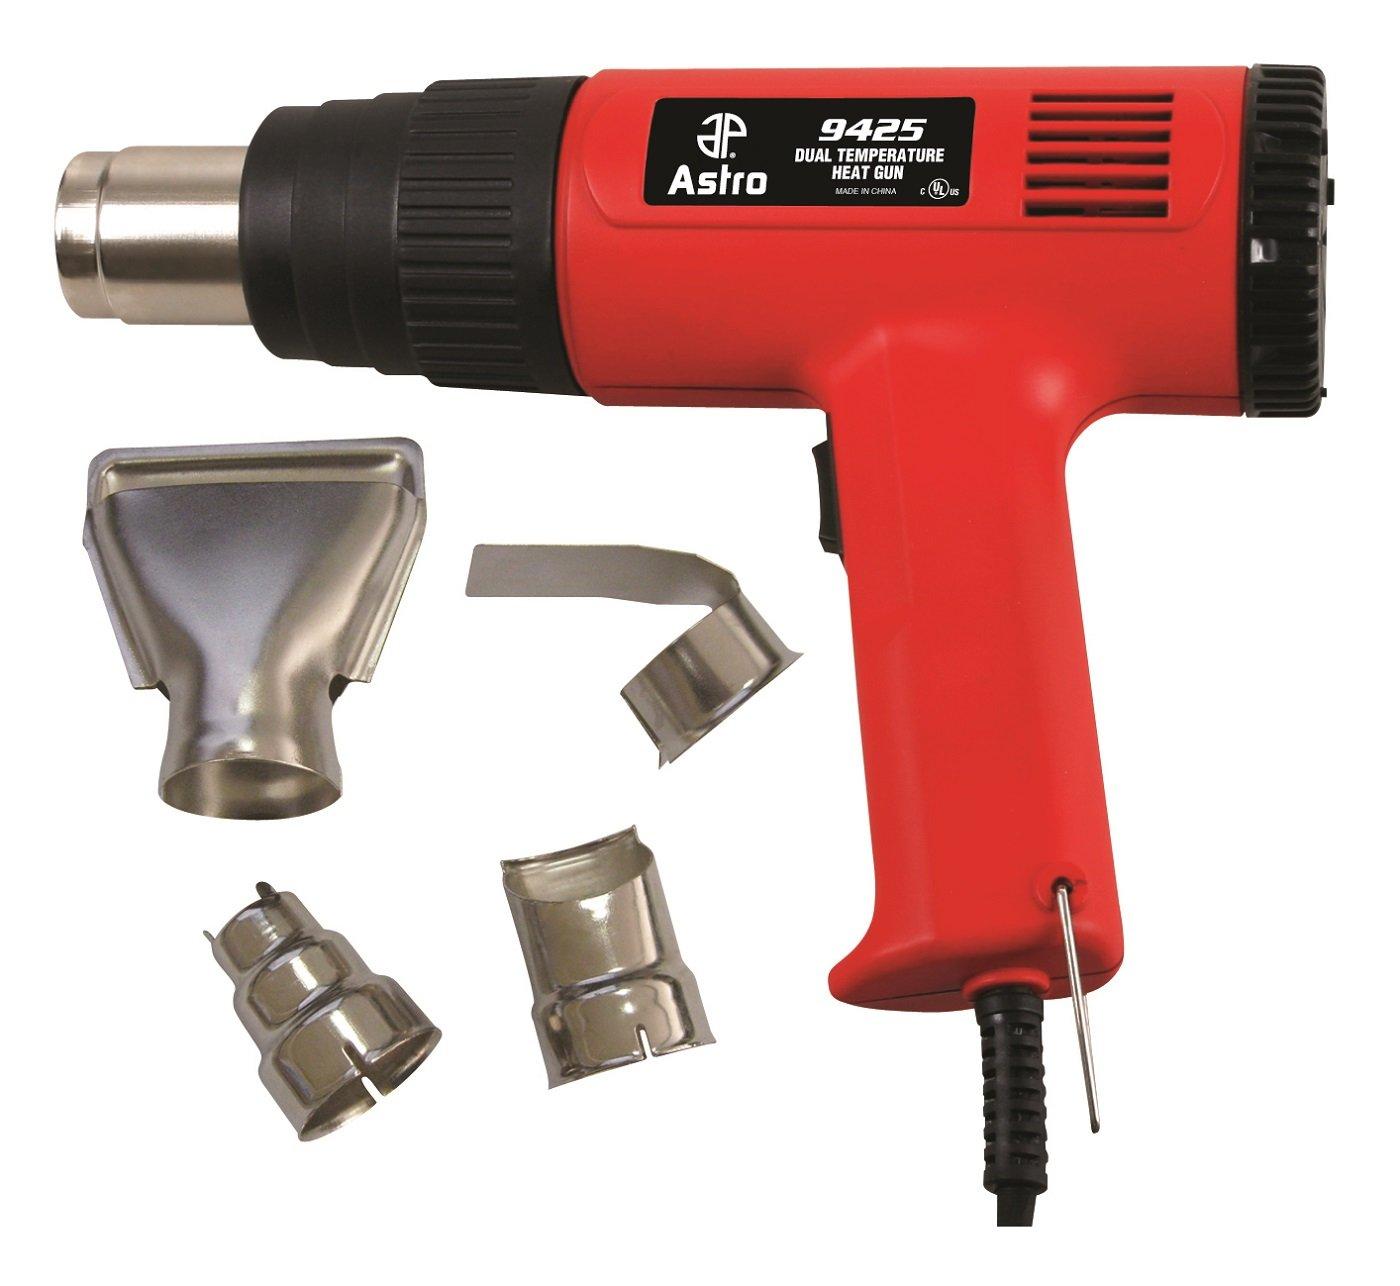 Astro 9425 Dual Temperature Heat Gun Kit by Astro Pneumatic Tool